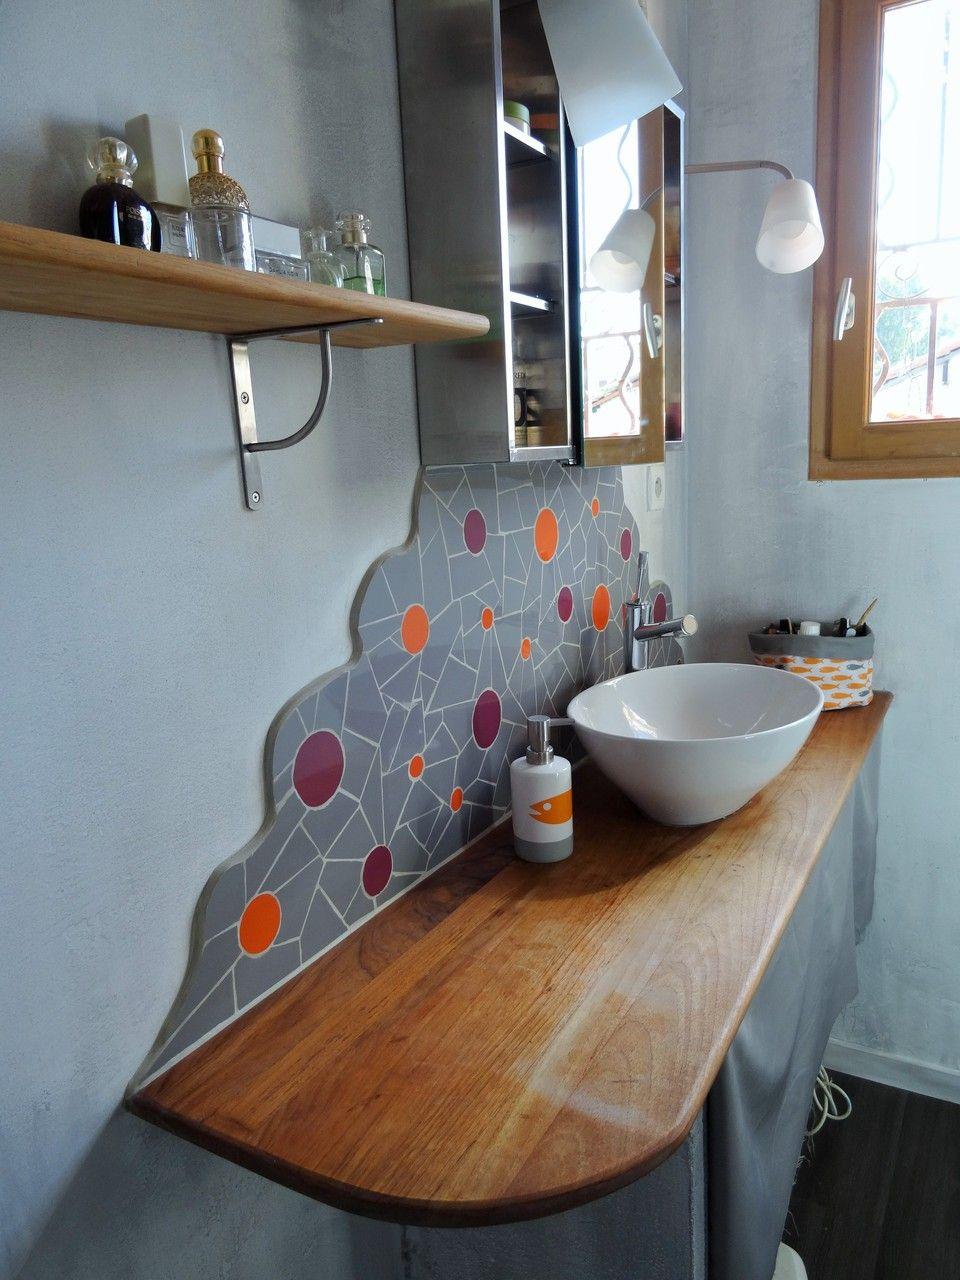 Cr dence de salle de bain en mosa que contemporaine motif - Mosaique adhesive pour salle de bain ...